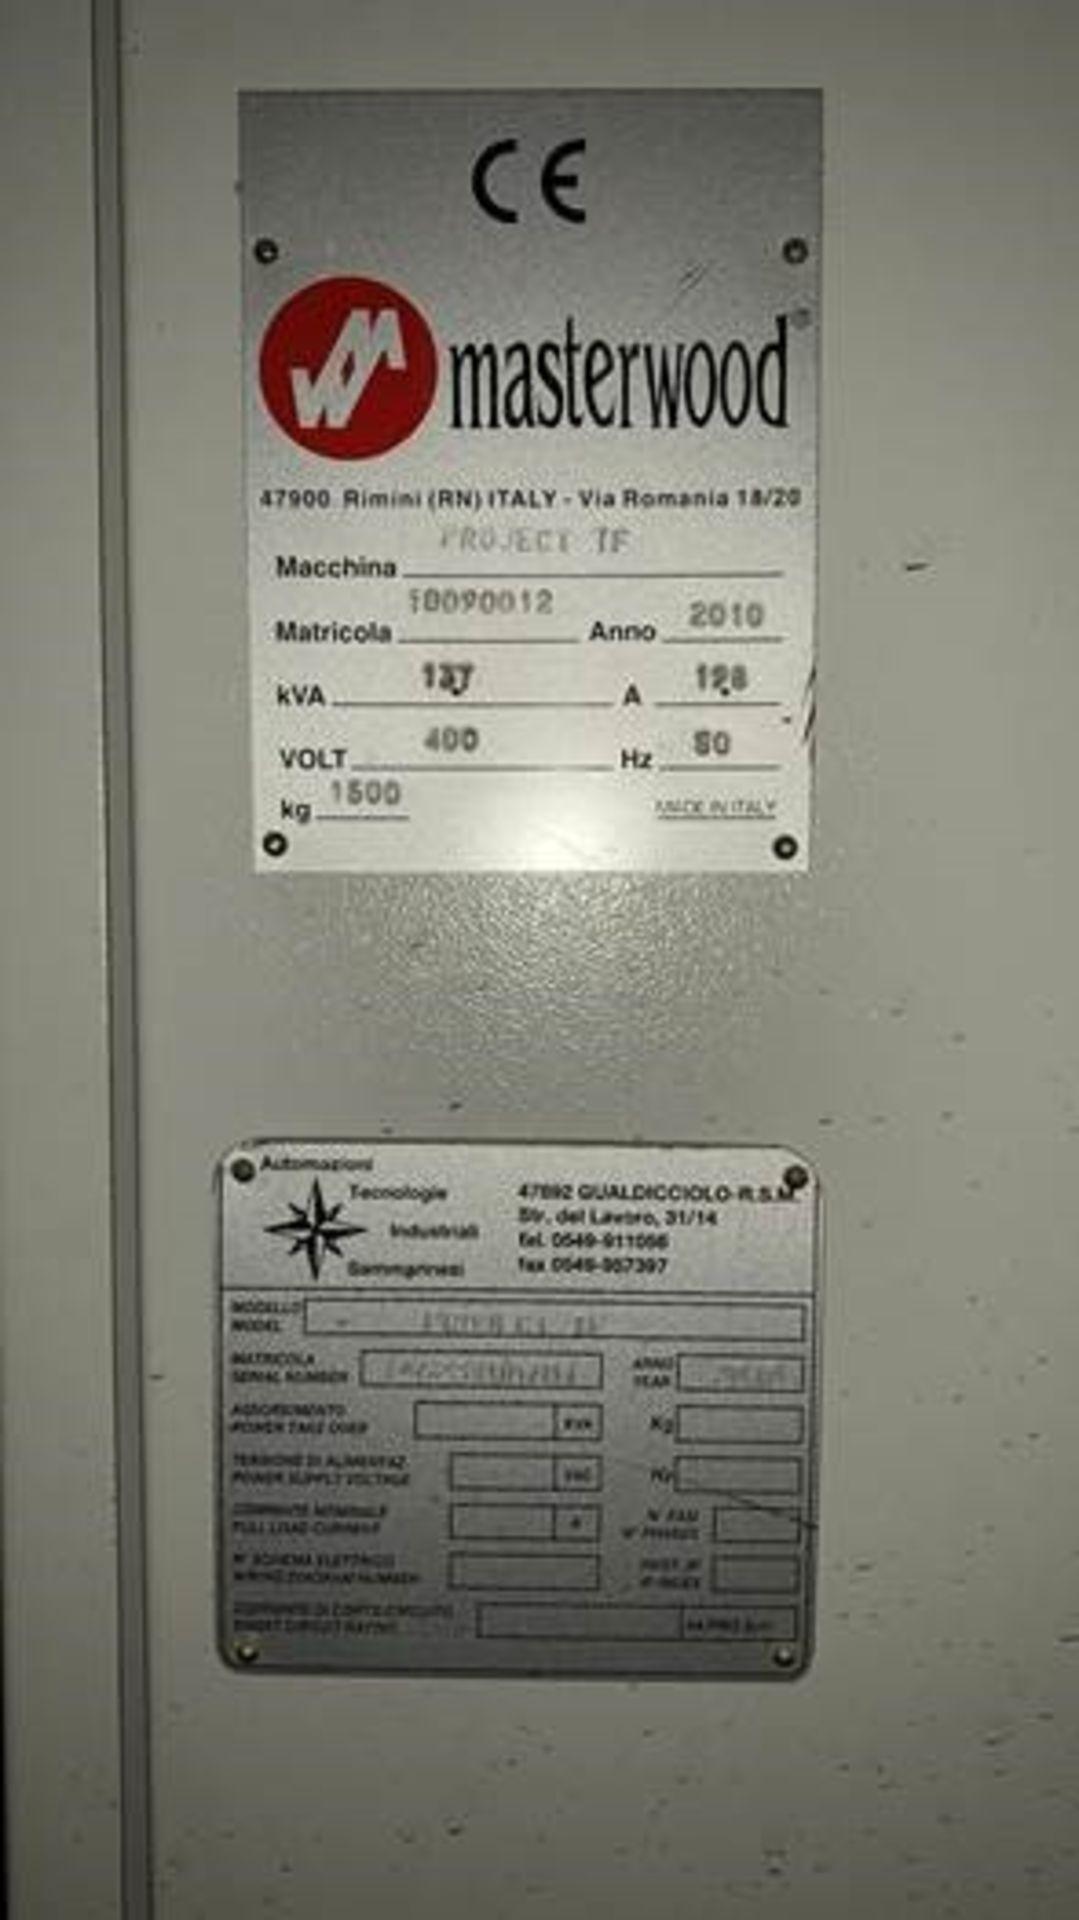 2010 Masterwood Project TF100 CNC Machine Centre - Image 4 of 7